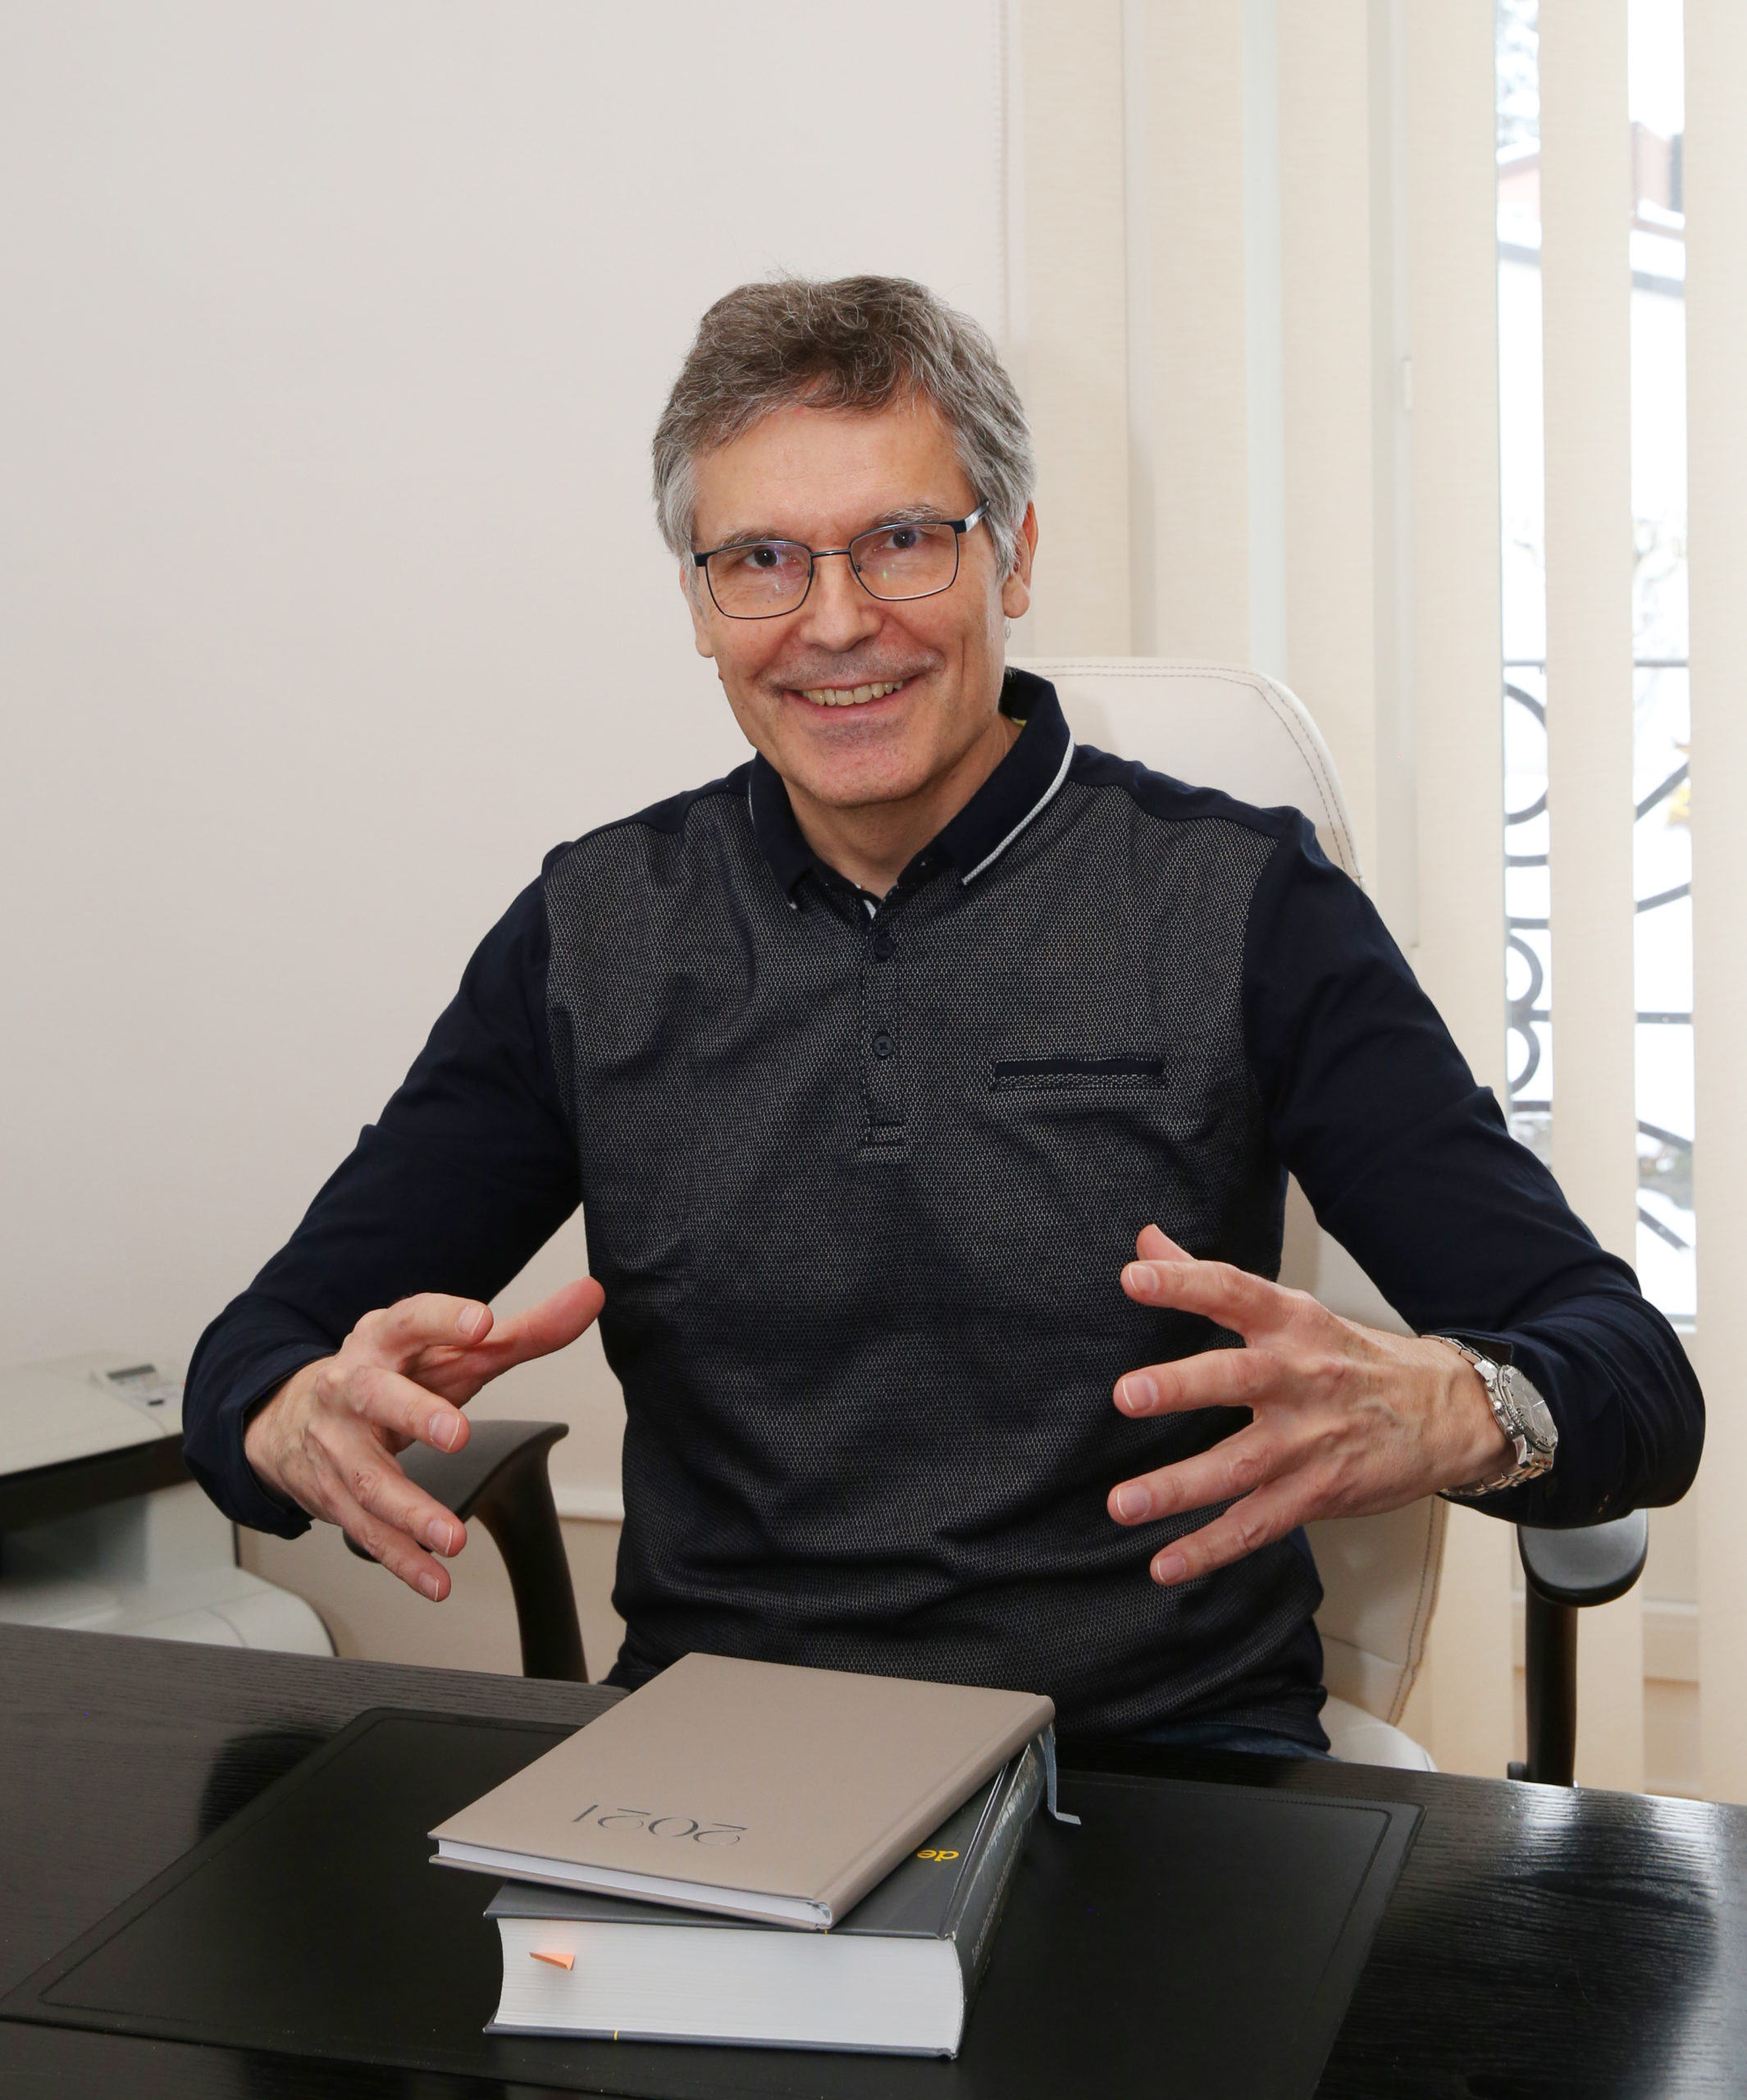 Alain Lieberherr à son bureau